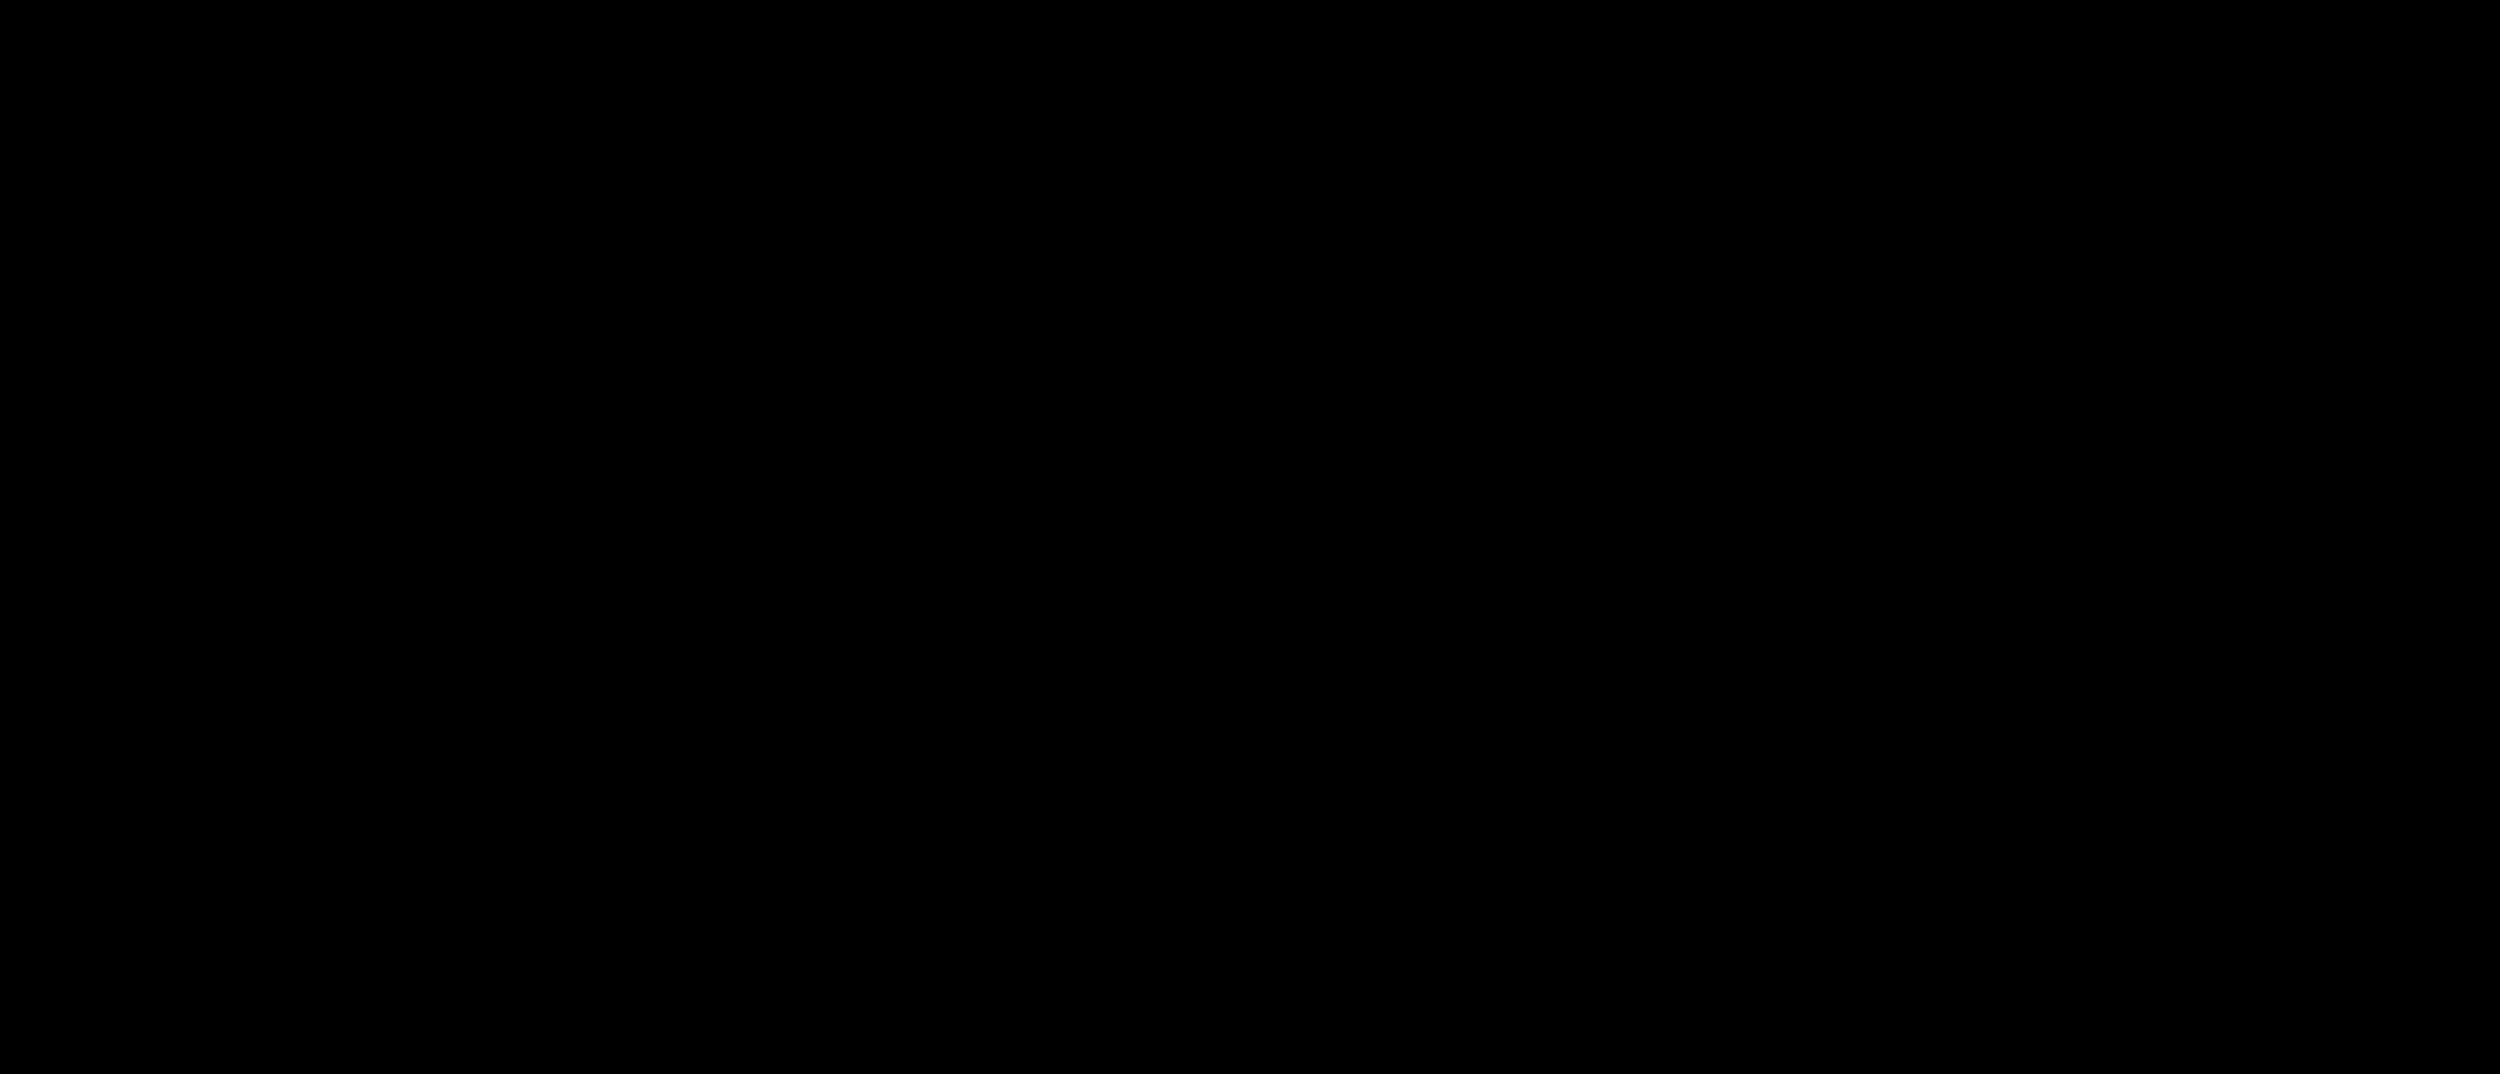 ABO0001_FULL LOGO_30TH ANNIVERSARY_BLACK_RGB.png